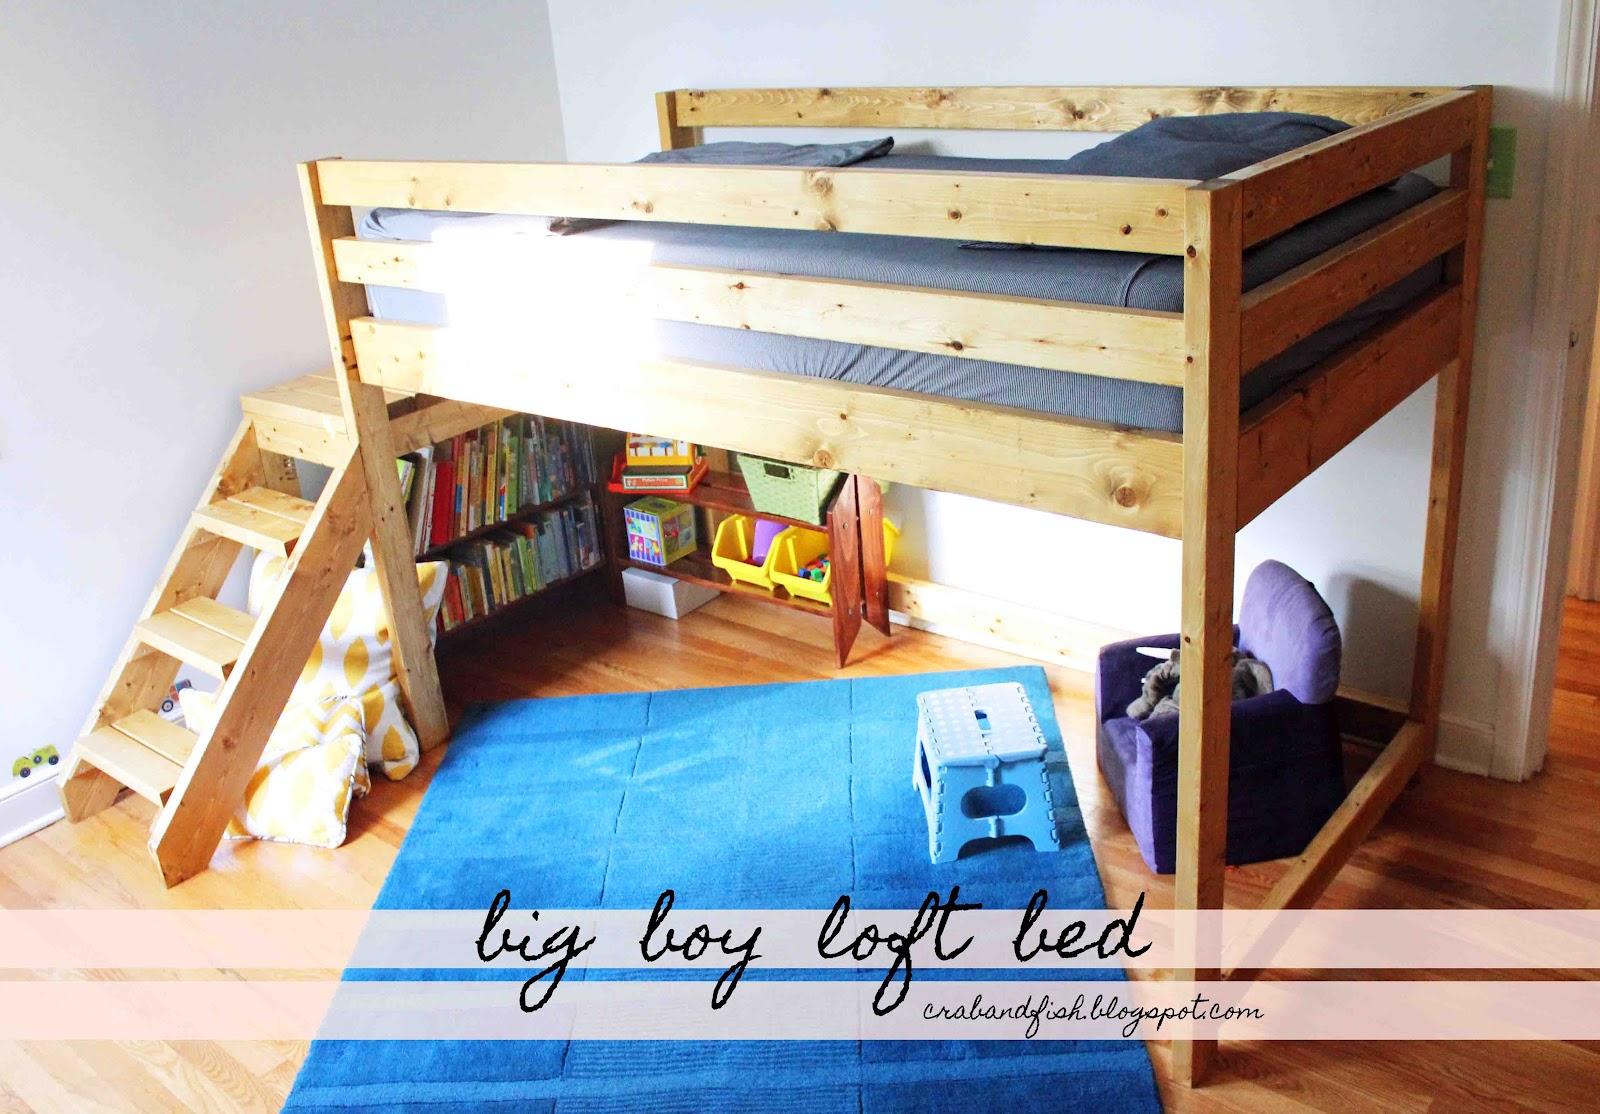 Best Woodworking Plans Free 2x4 Loft Bed Wooden Plans